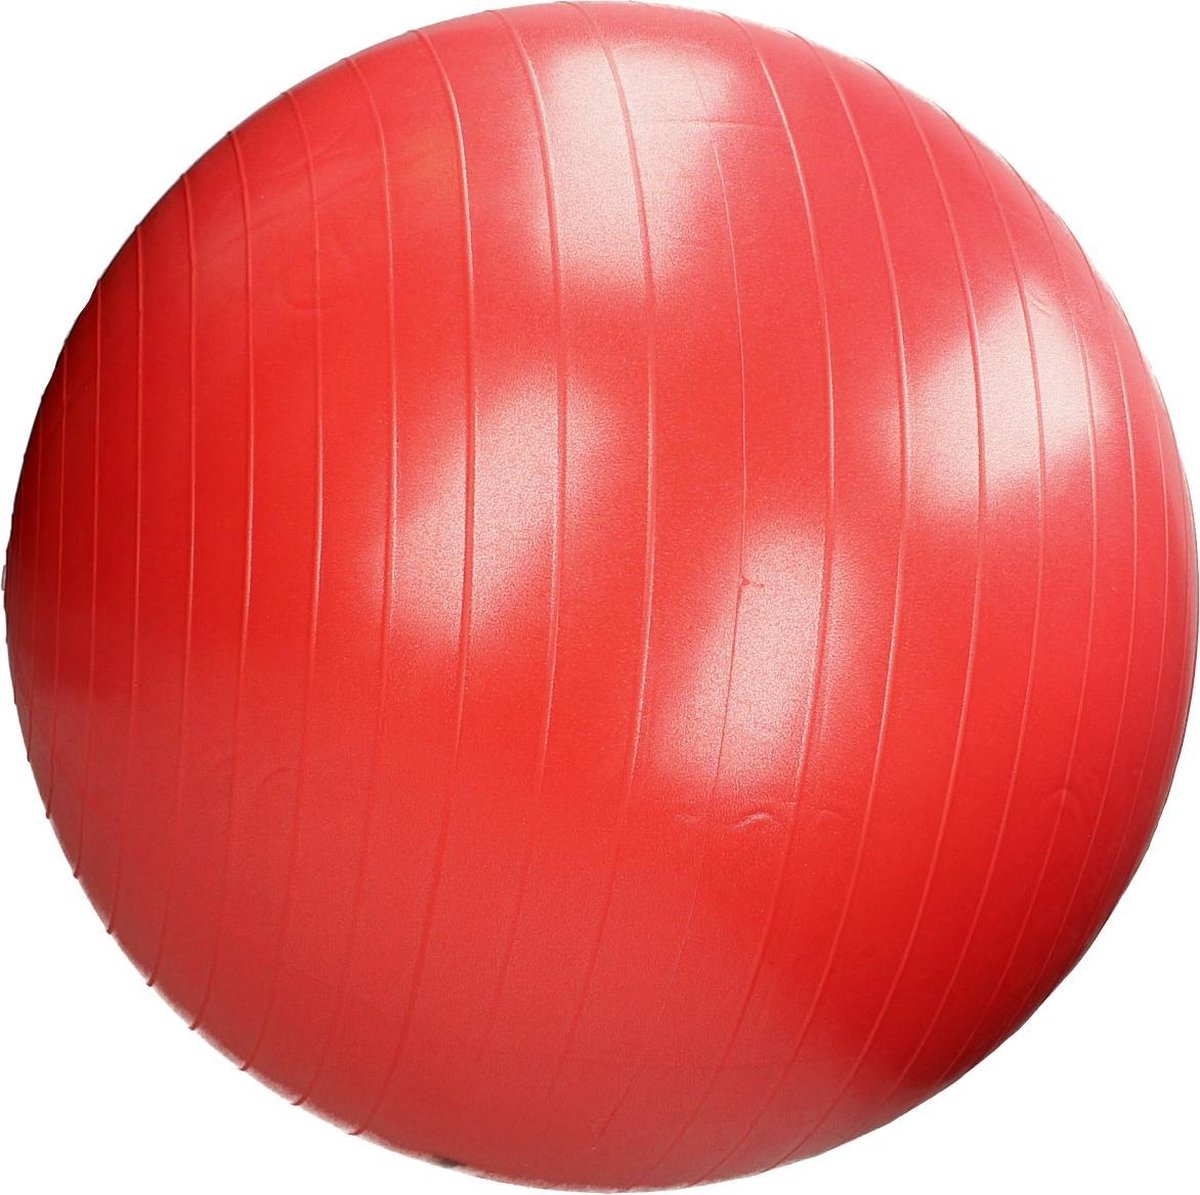 Jolly Mega bal Speelbal - Rood - mt - 64cm